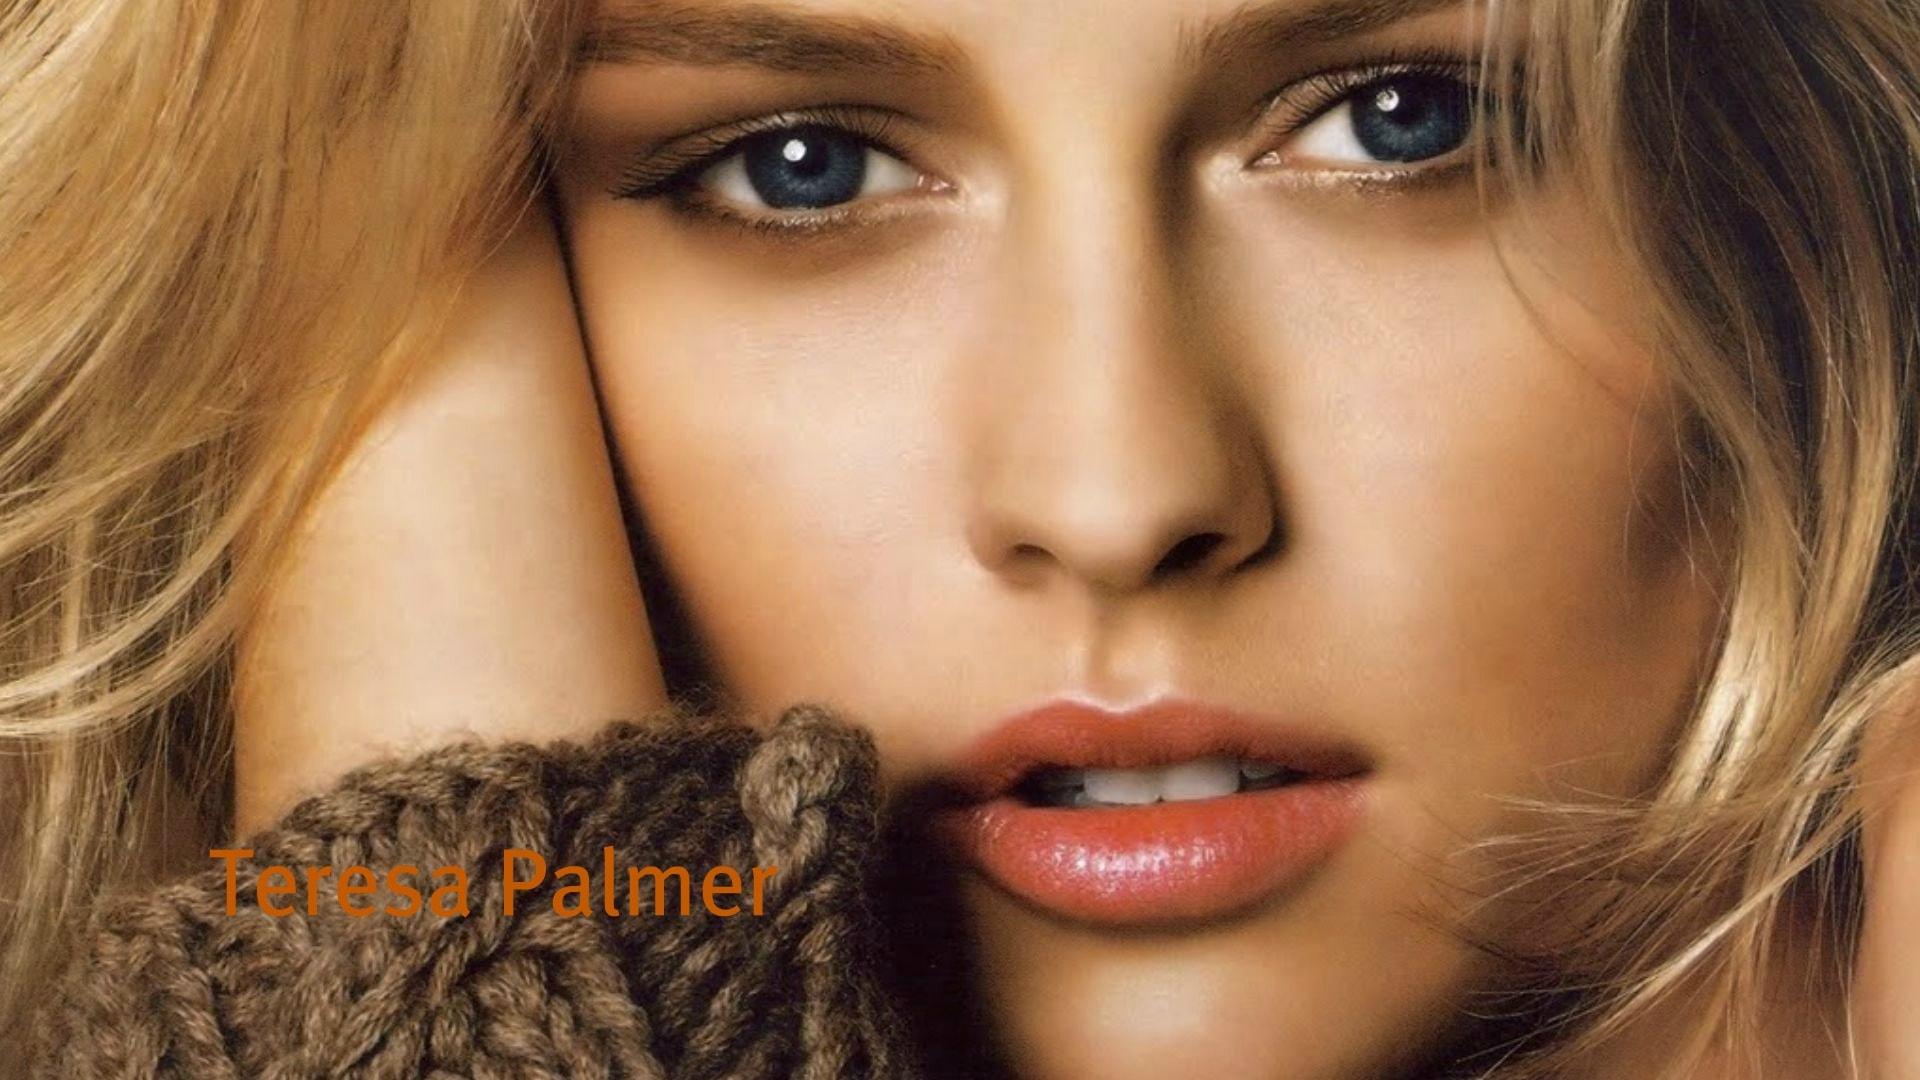 Teresa Palmer Background